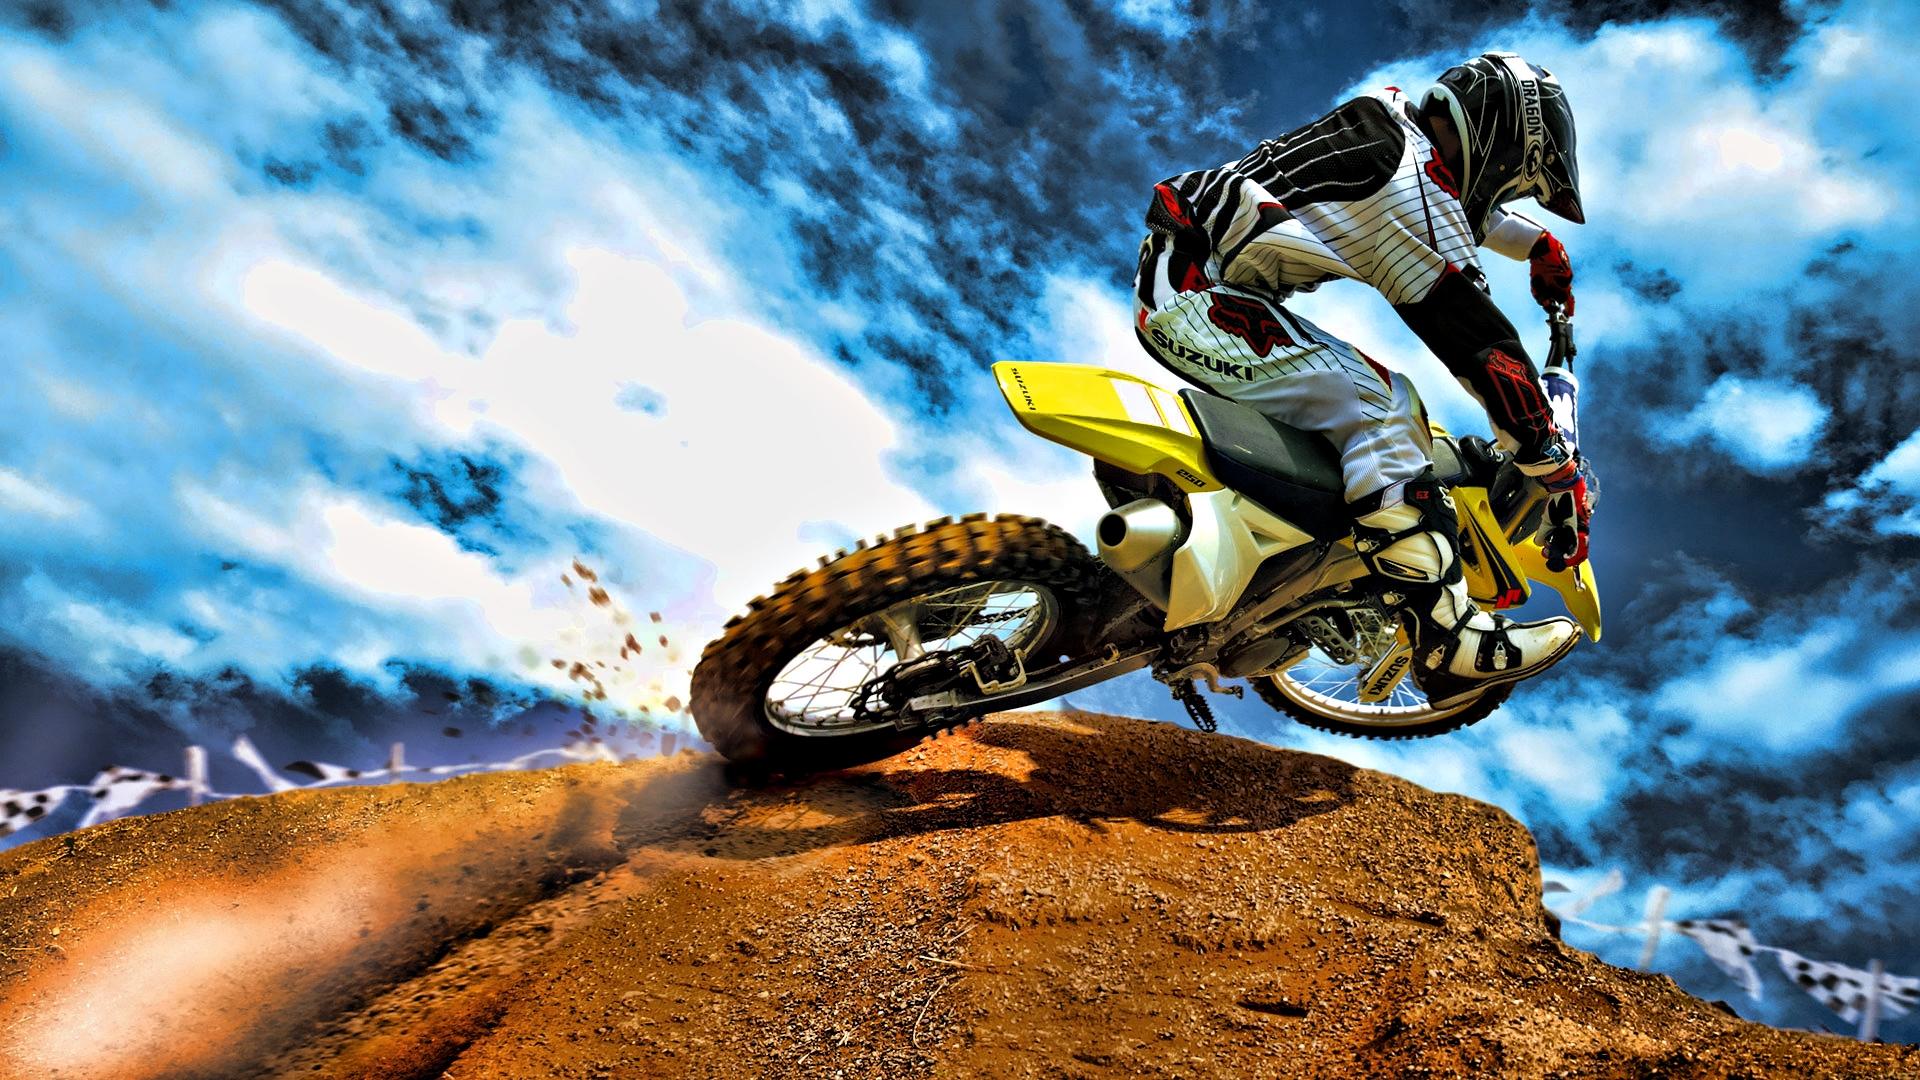 Suzuki Motocross Wallpaper High Res Pics 66723 1931 Wallpaper Cool 1920x1080